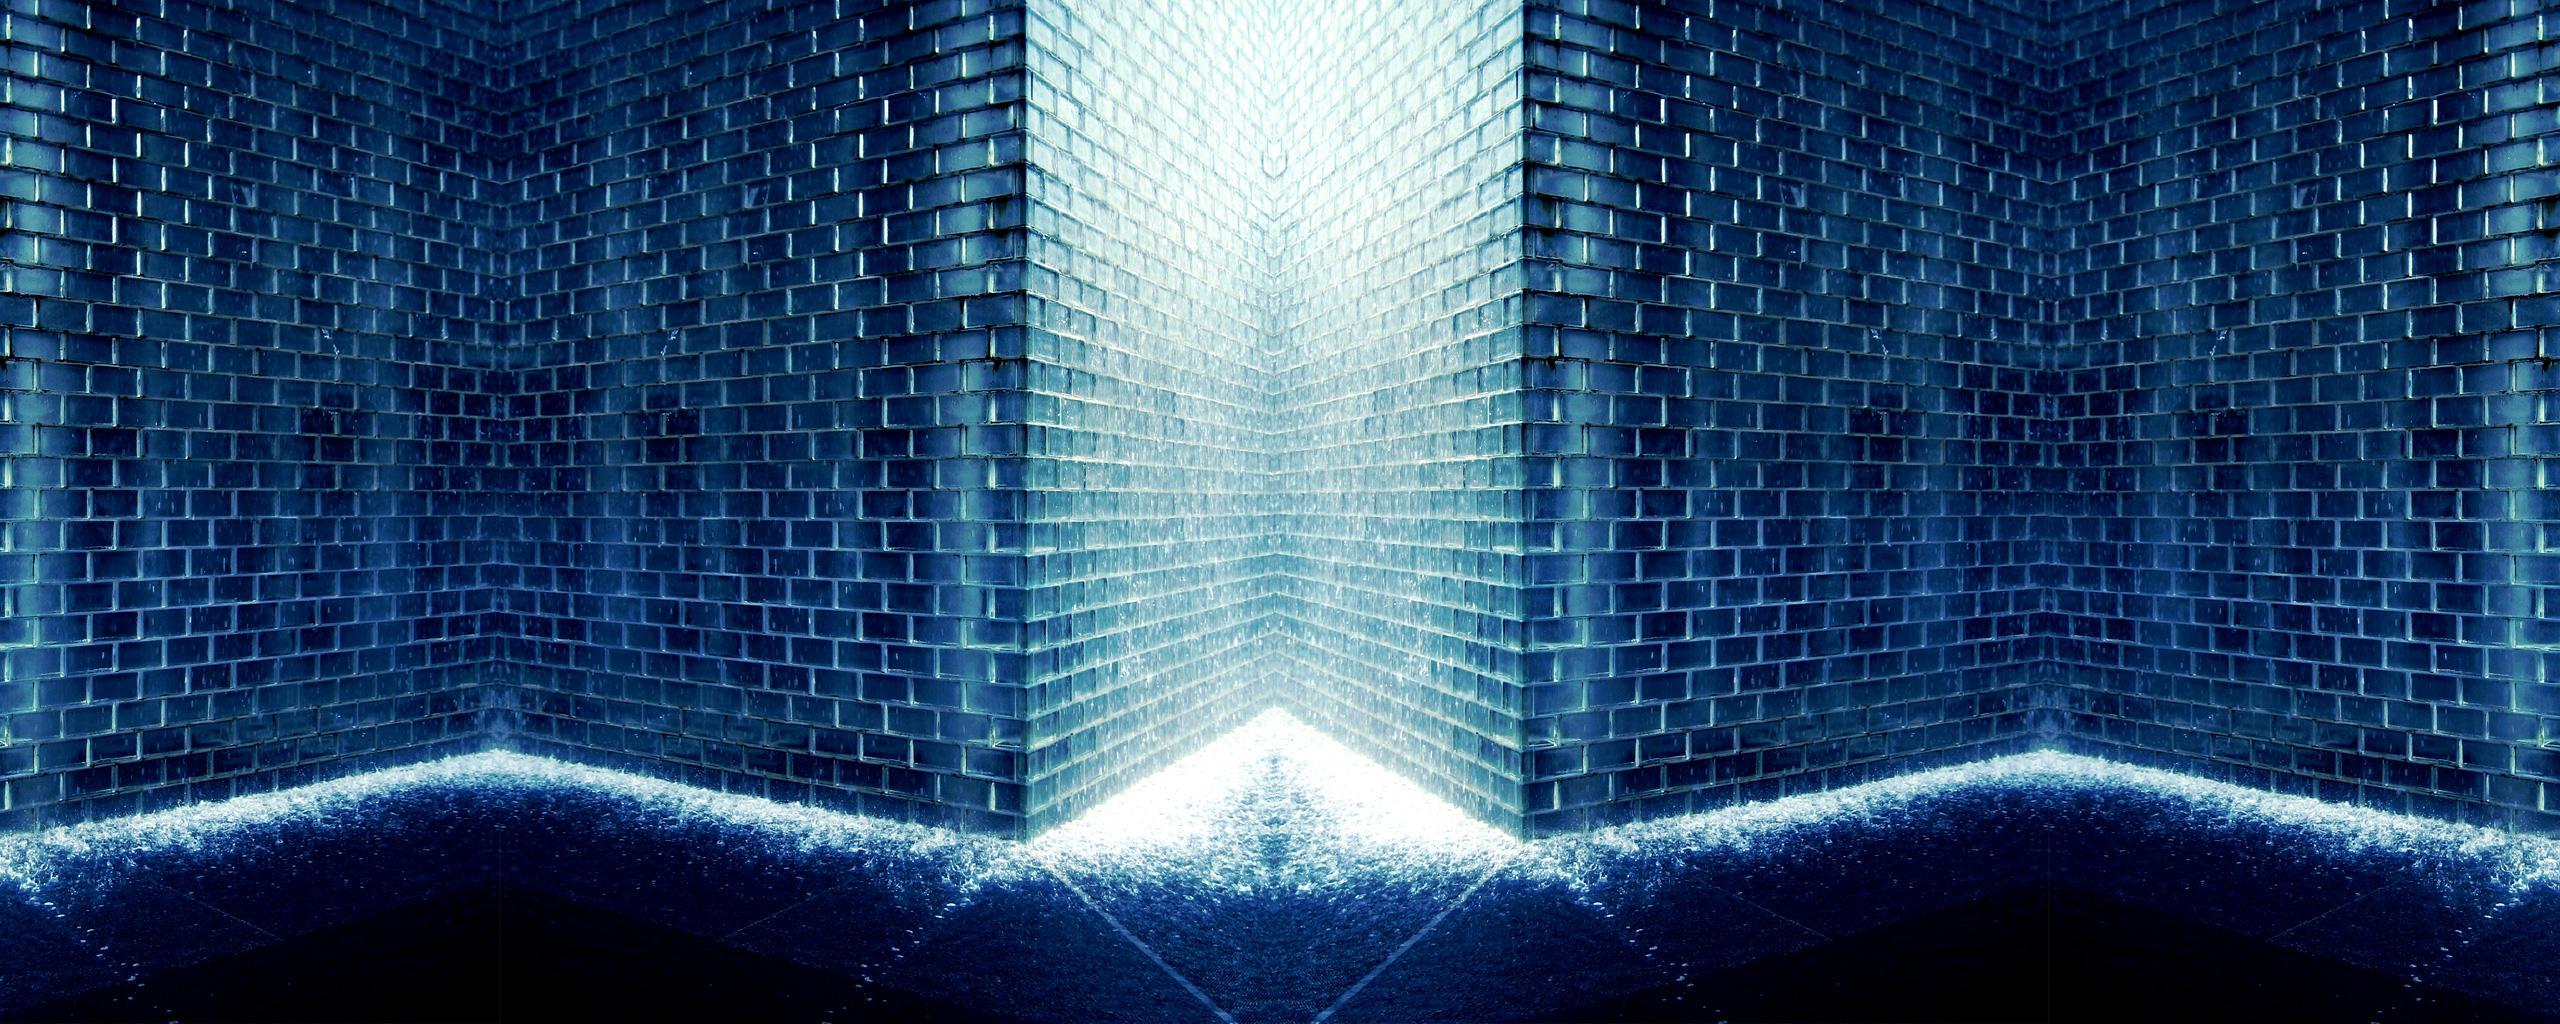 niche - WS by ether